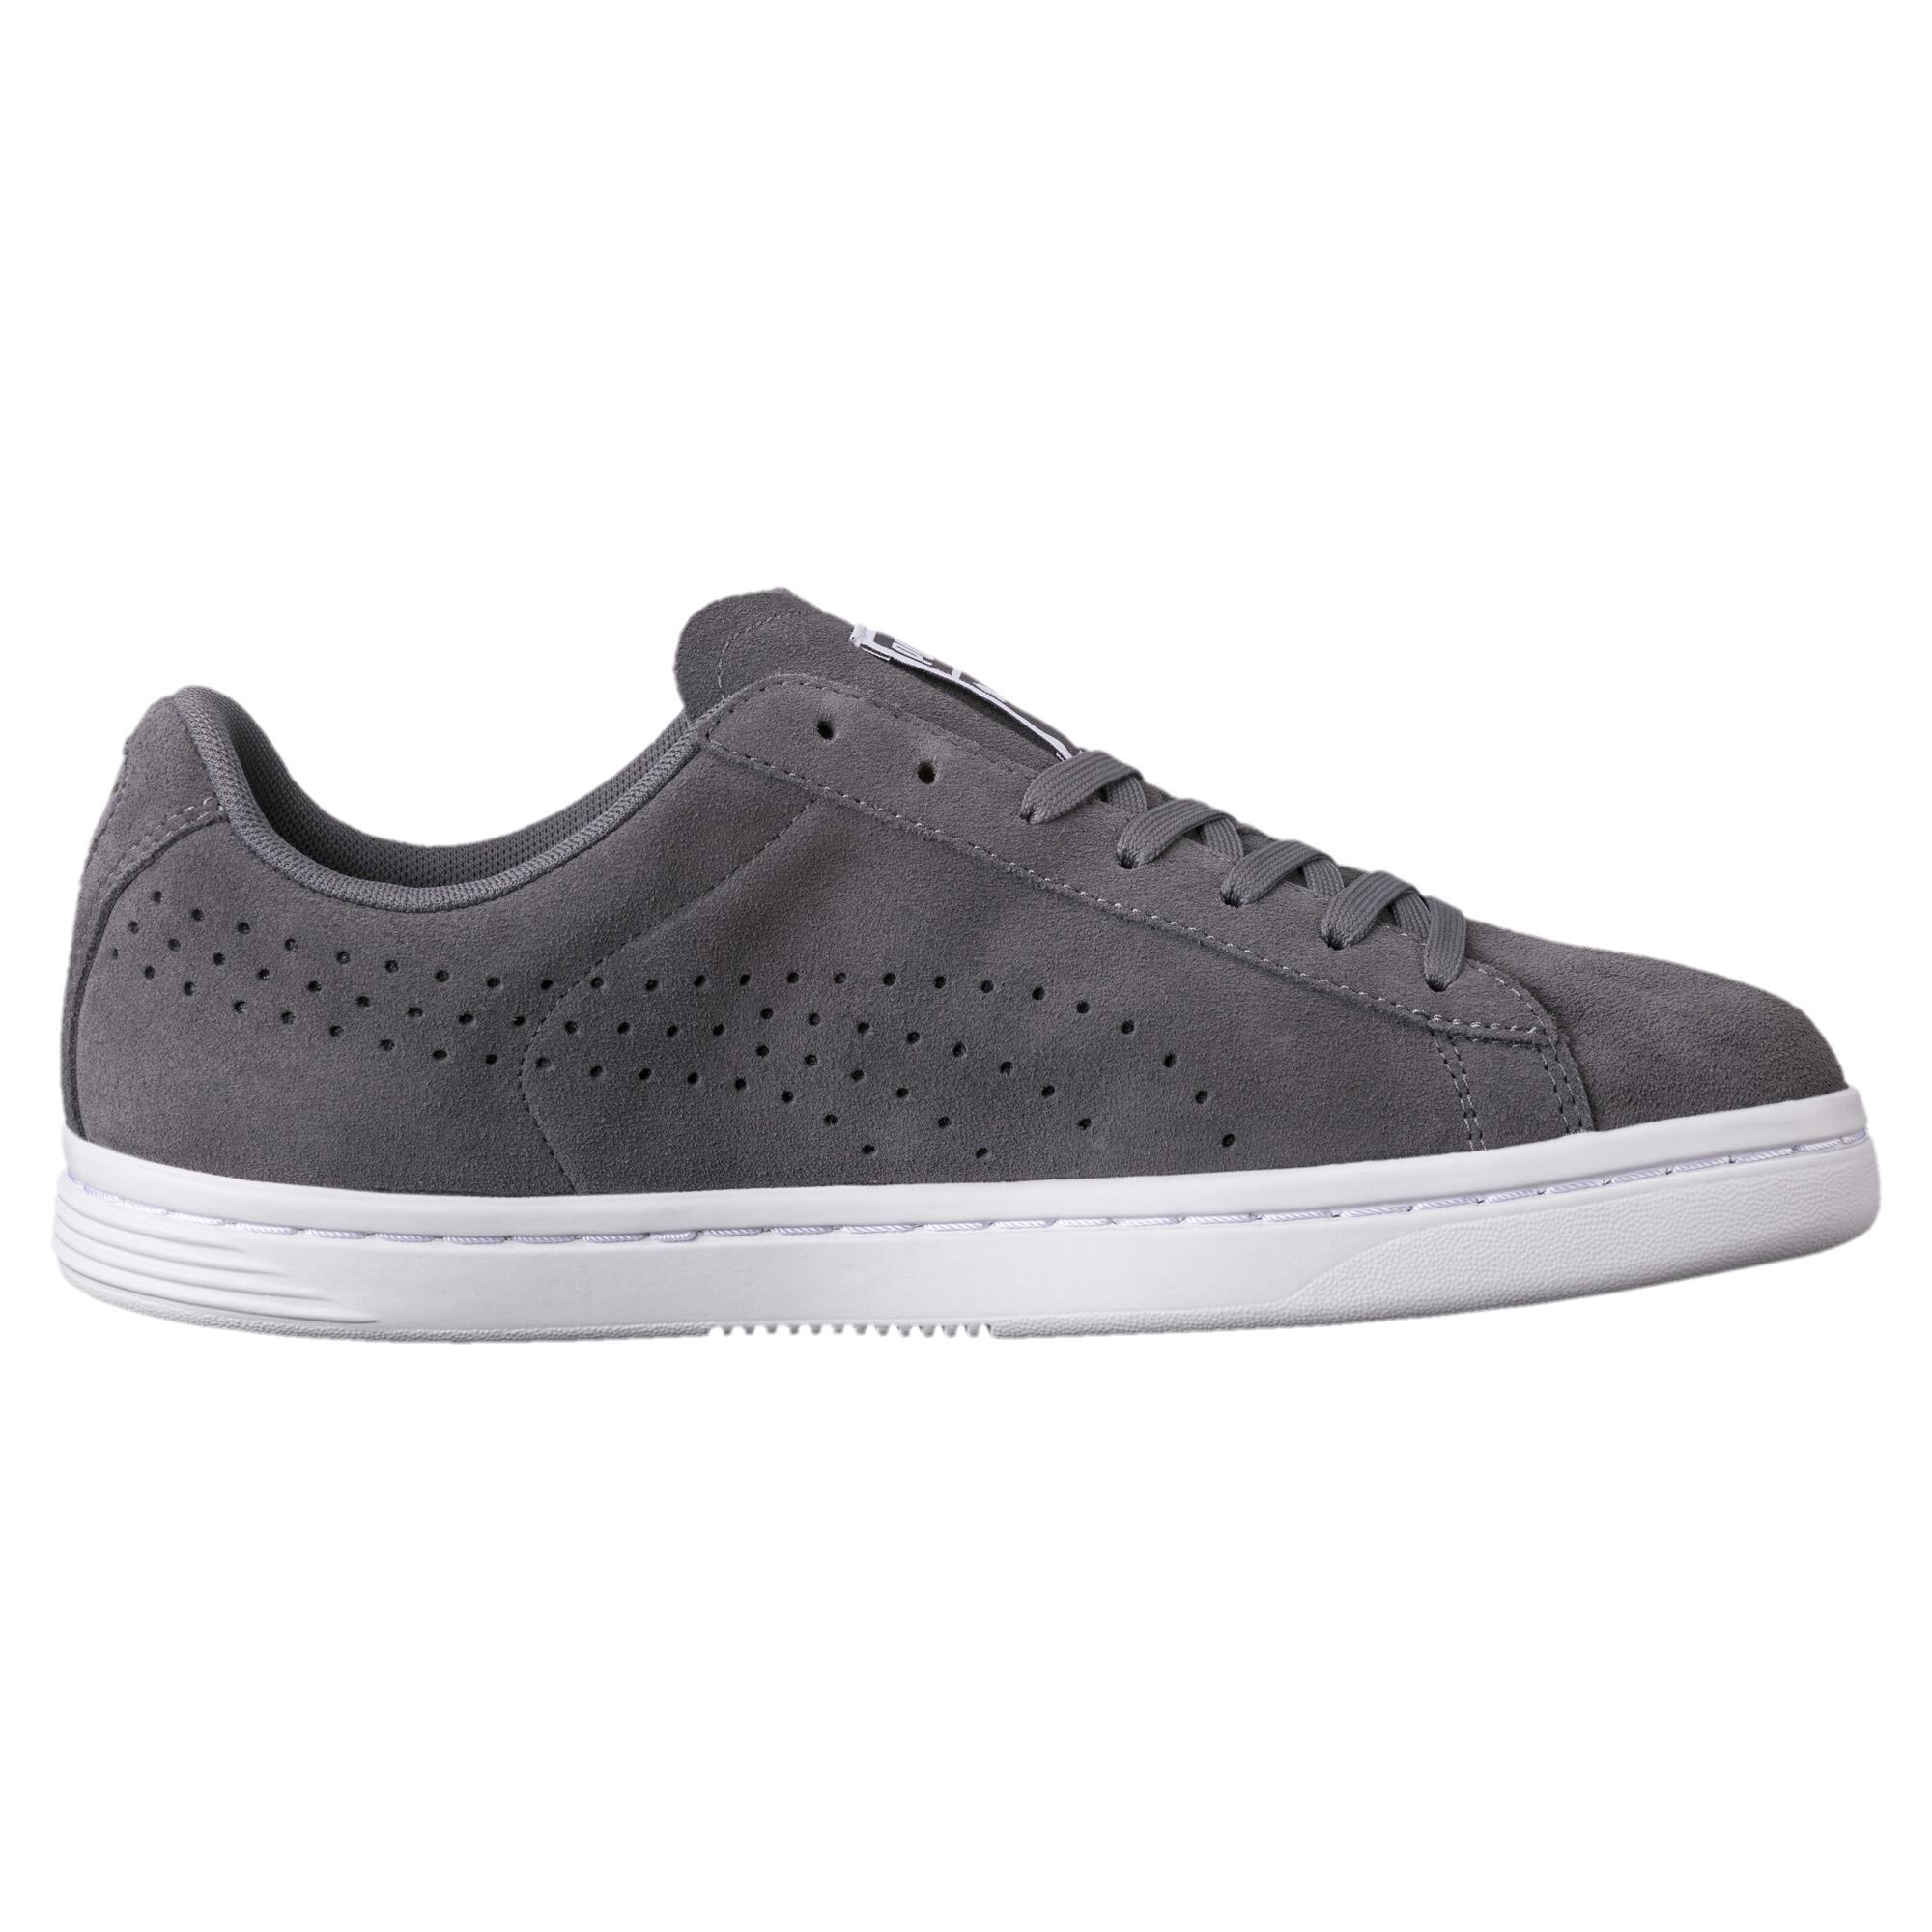 PUMA-Court-Star-Suede-Sneakers-Unisex-Shoe-Sport-Classics thumbnail 12